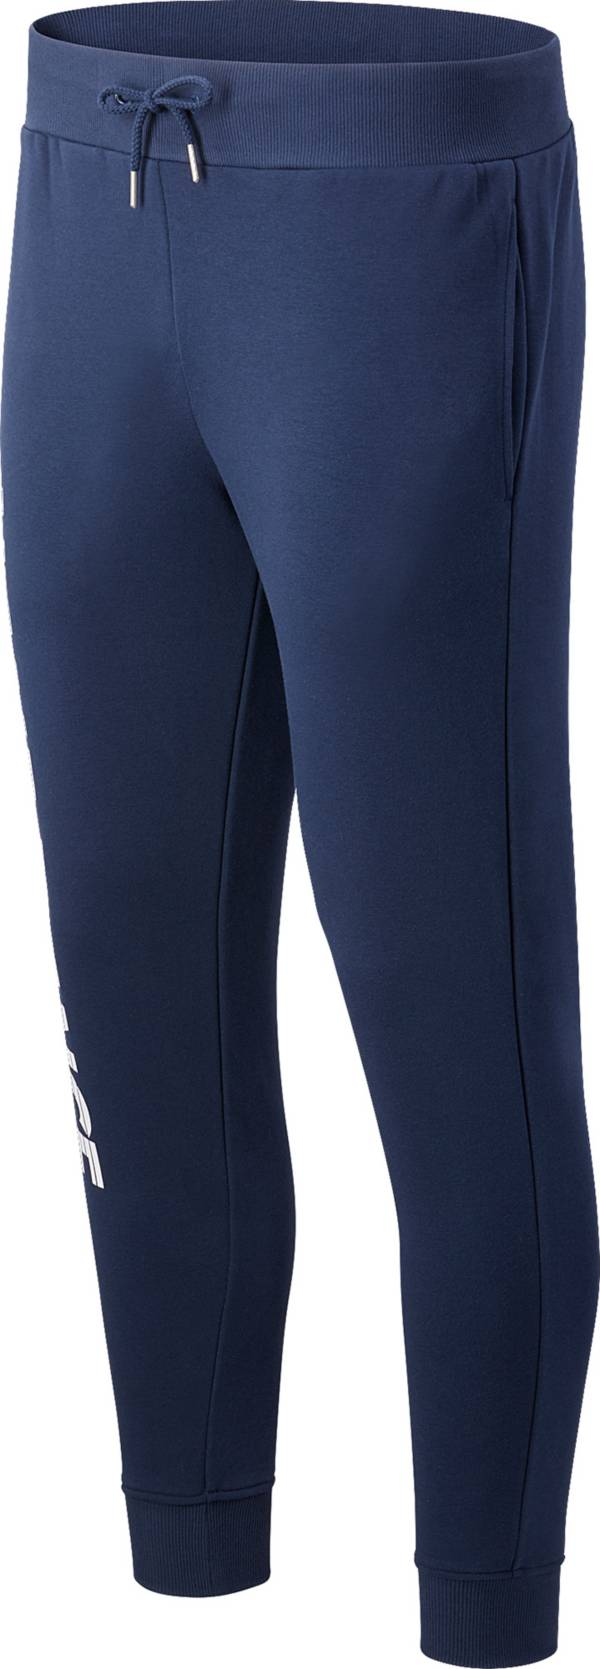 New Balance Men's Essentials Speed Sweatpants product image